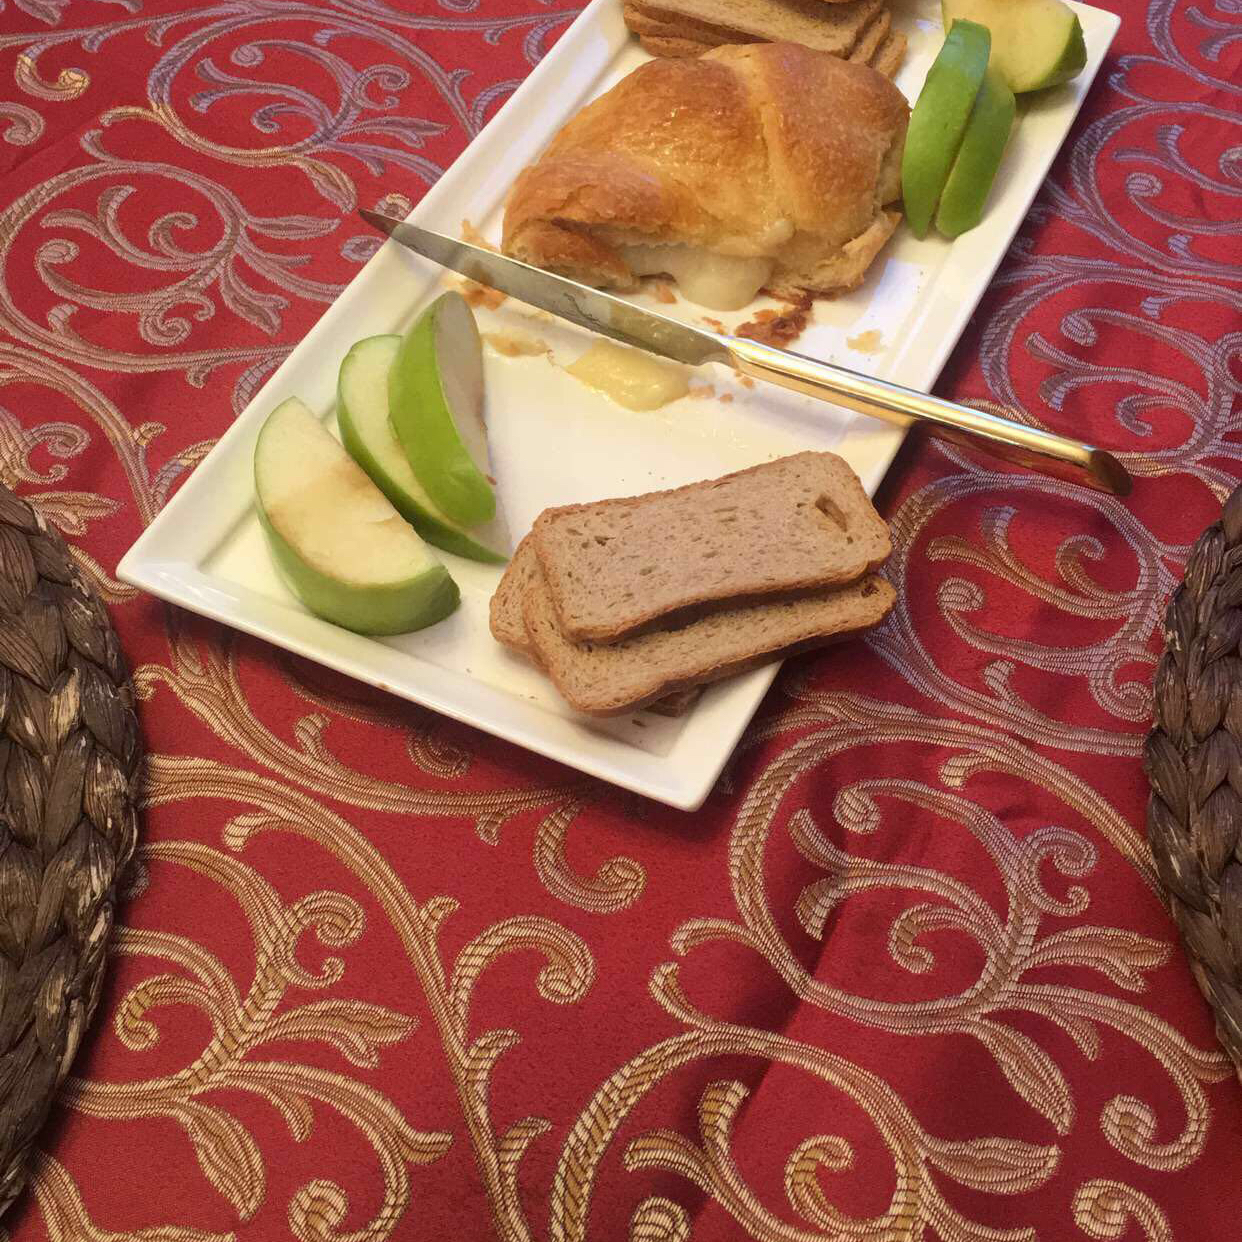 Honey Brie Spread amberlin